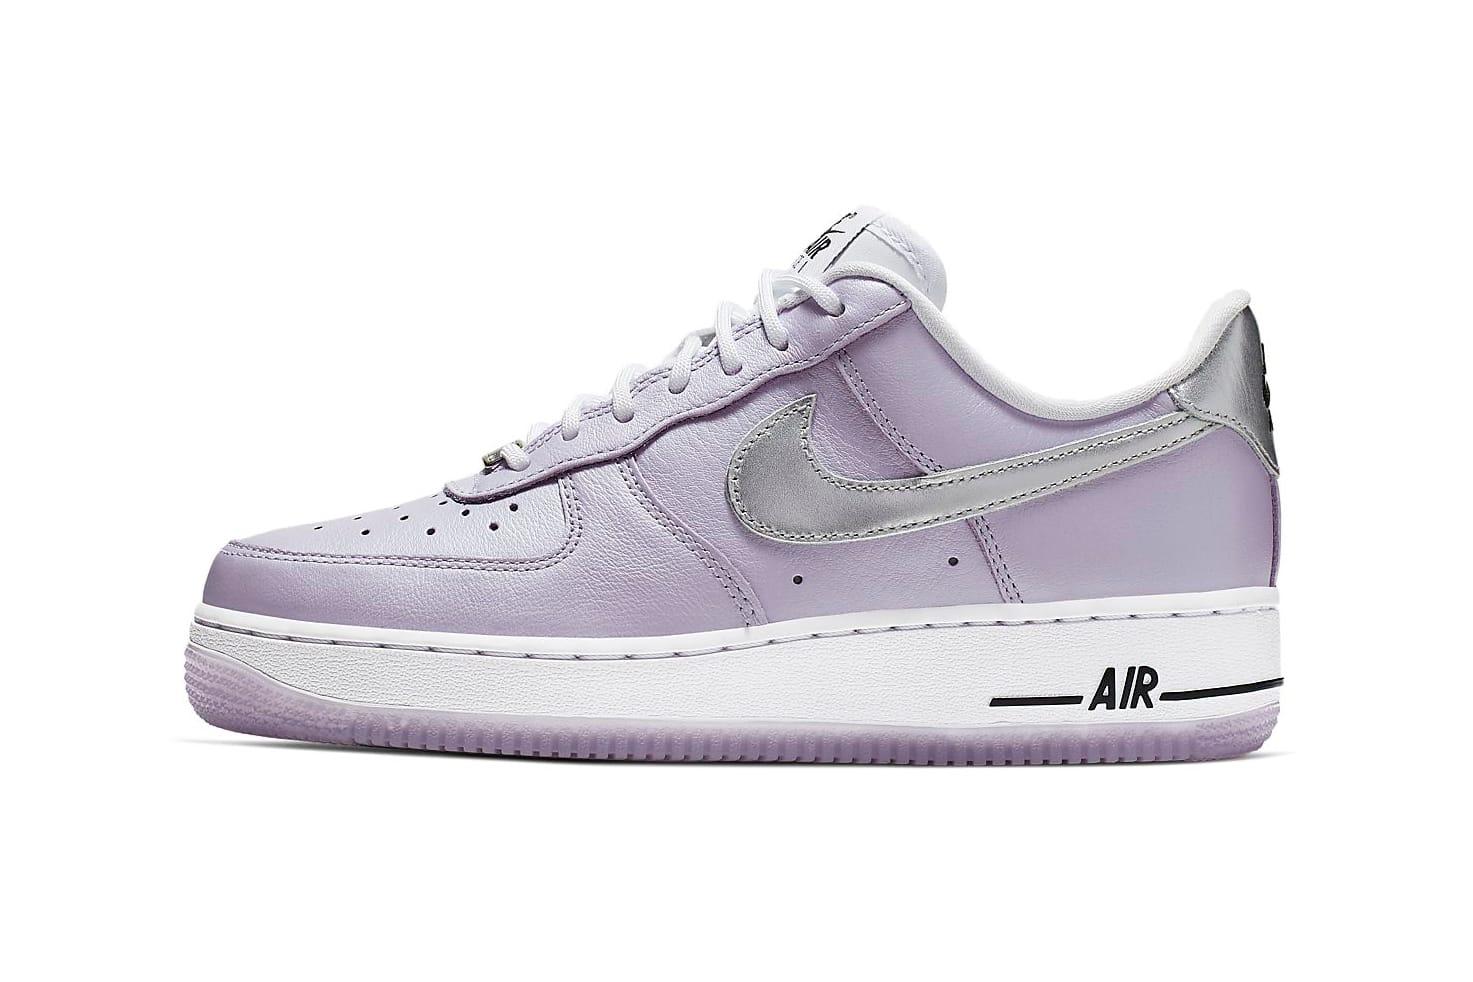 Nike Air Force 1 Metallic Lilac